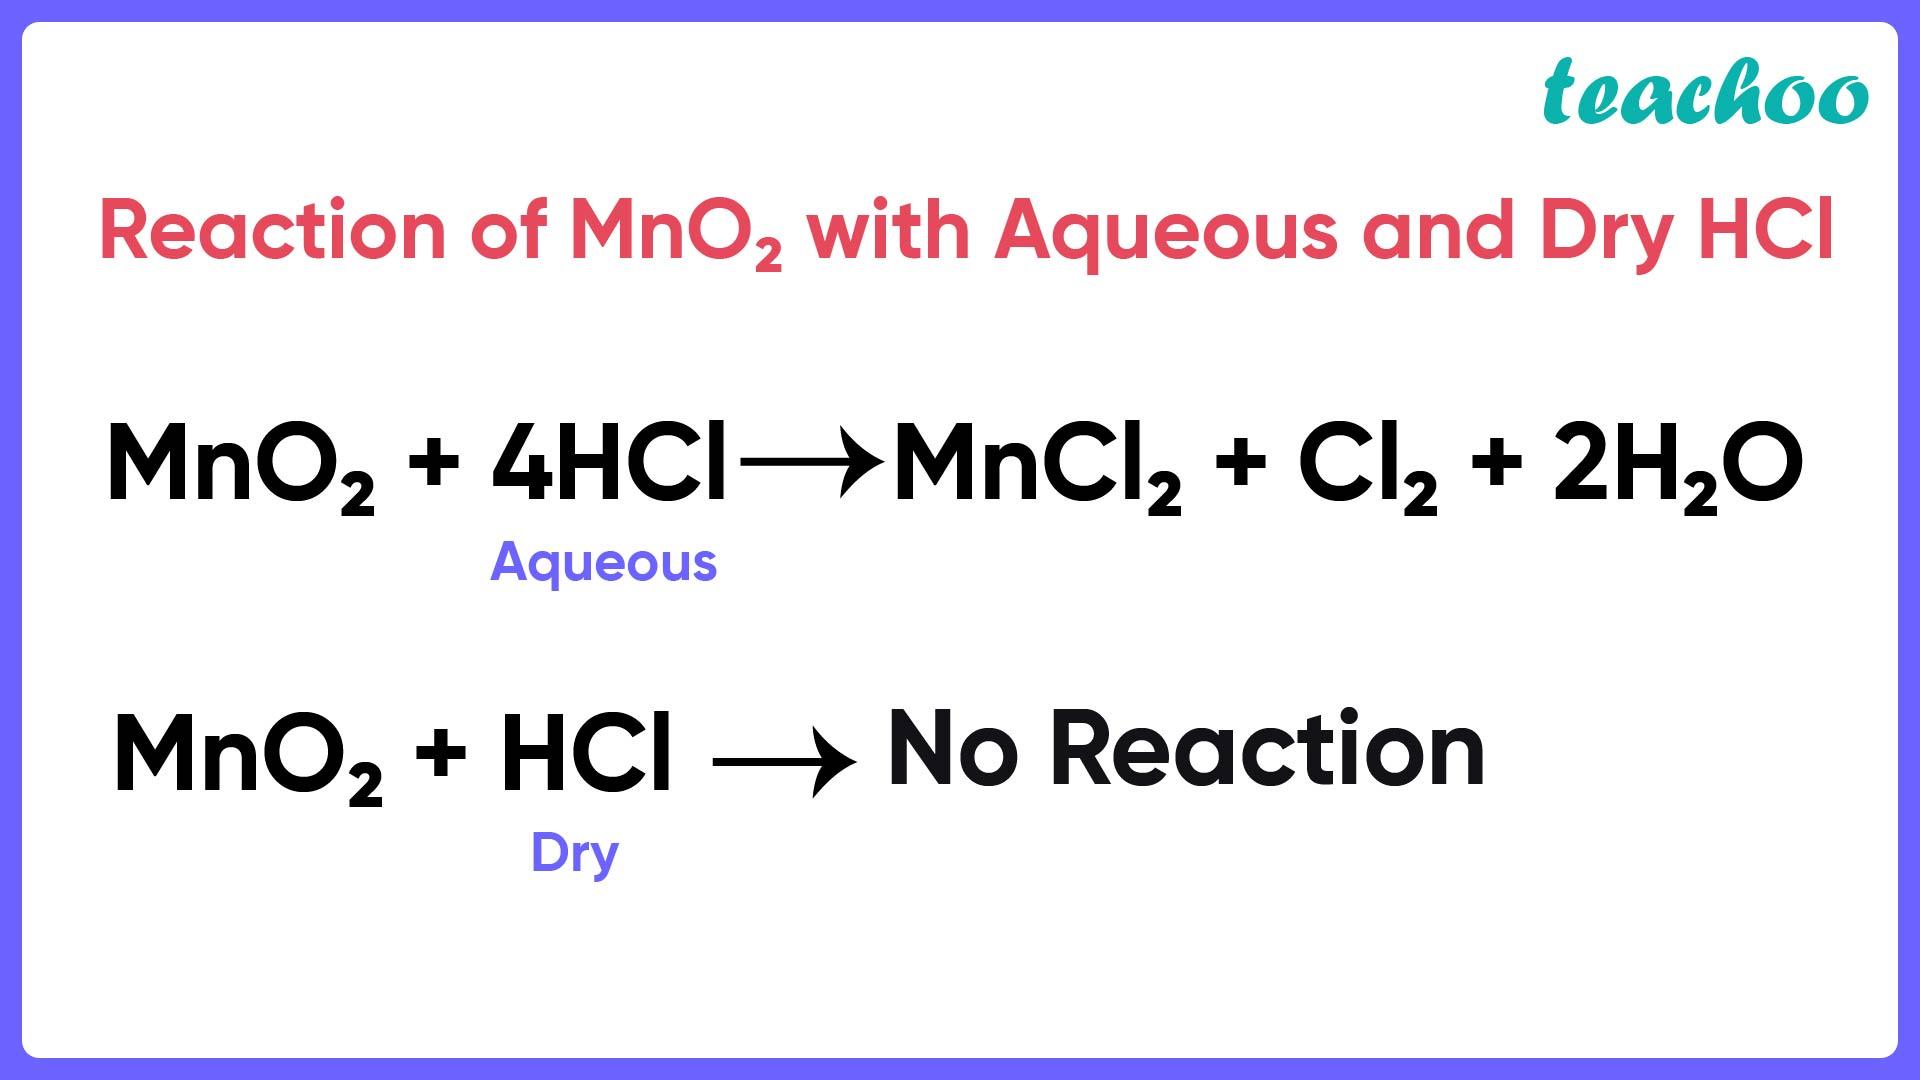 Reaction of MnO2 with Aqueous and Dry HCl-01 - Teachoo.jpg